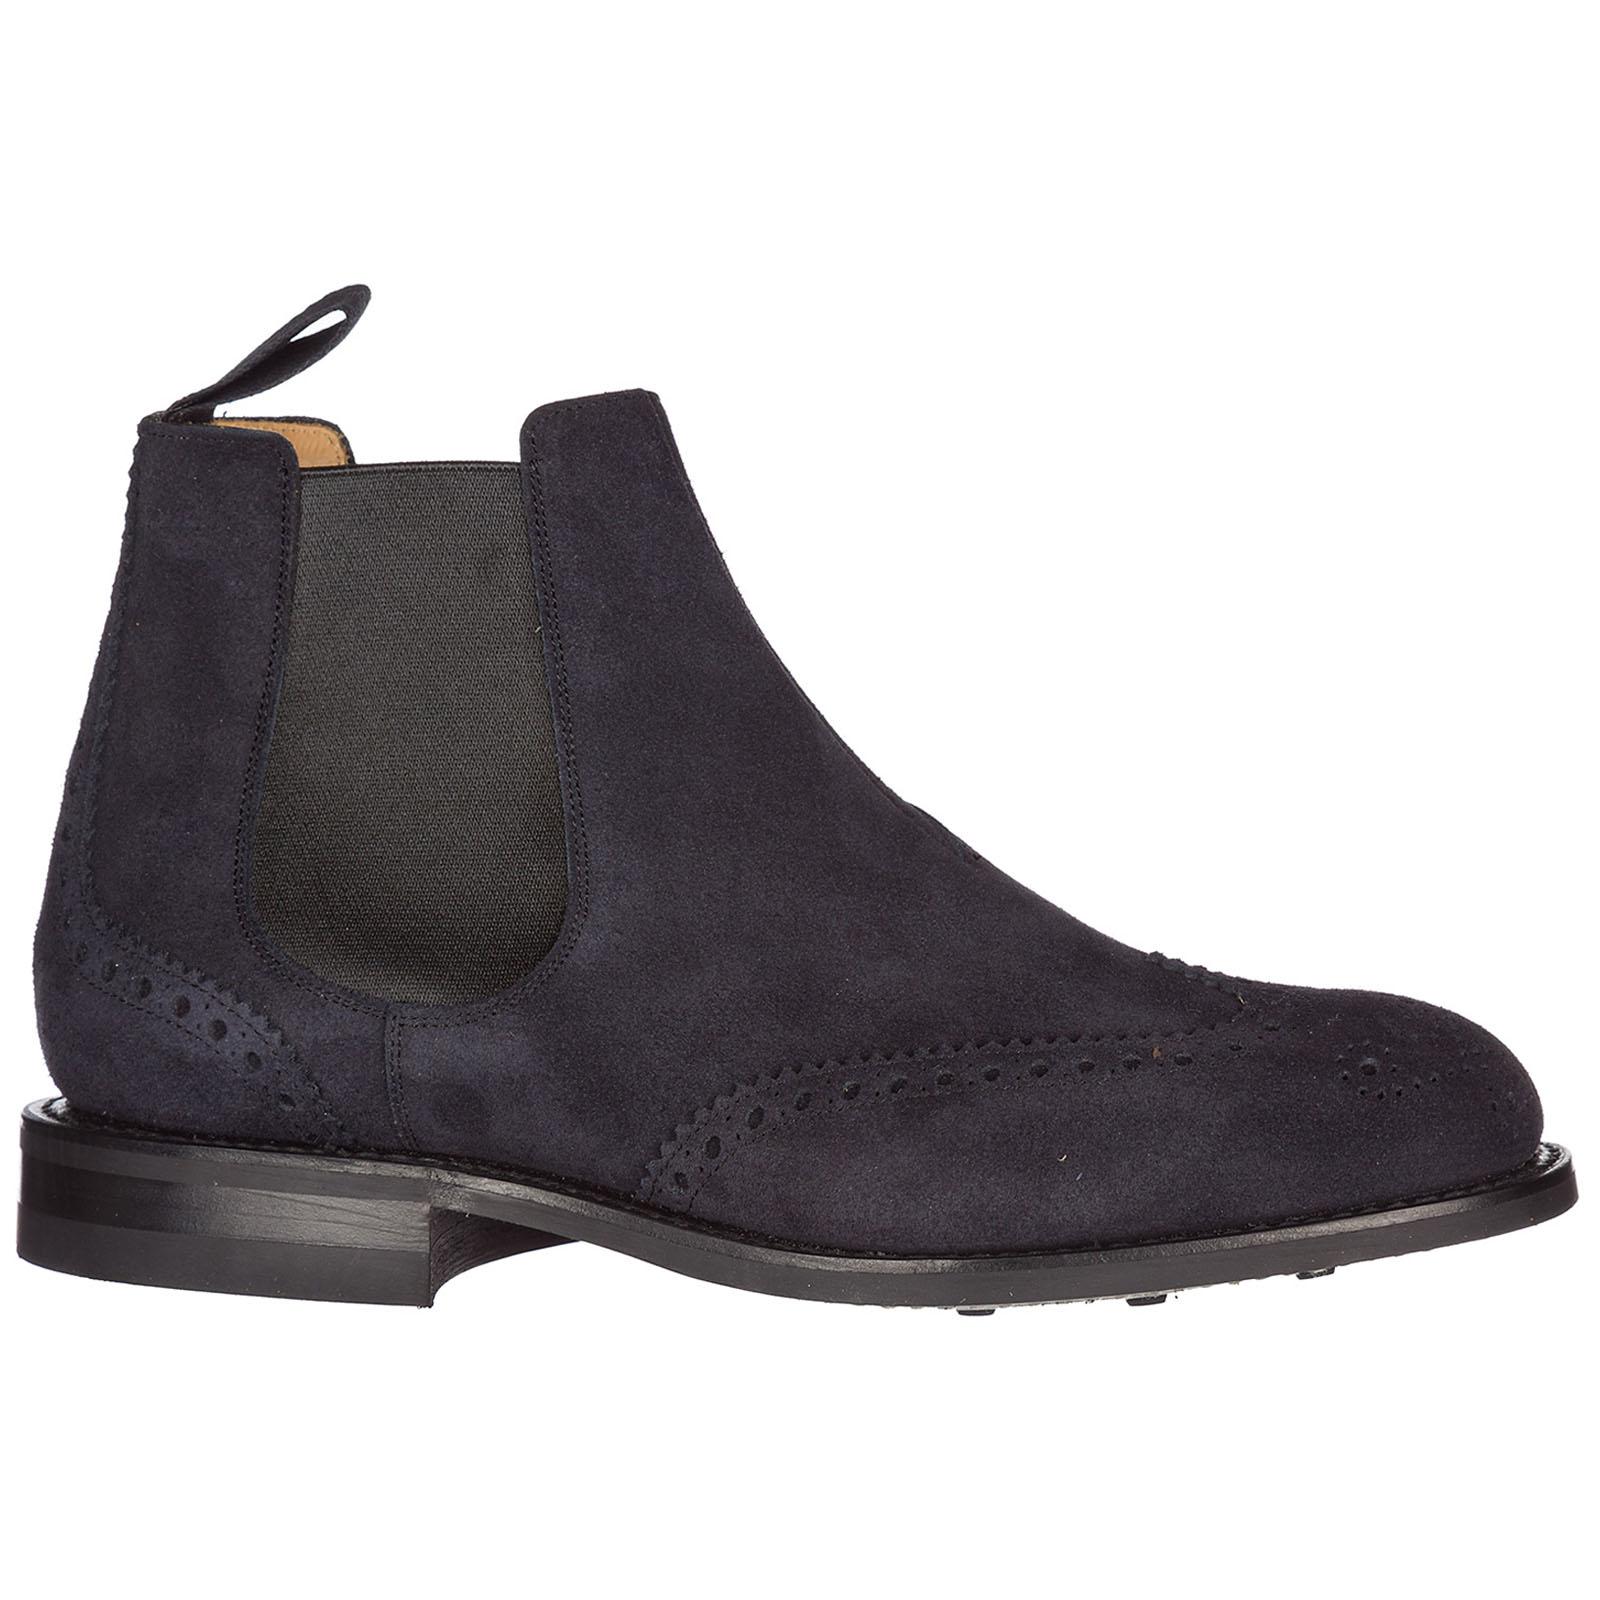 Wildleder stiefeletten boots herren ravenfield